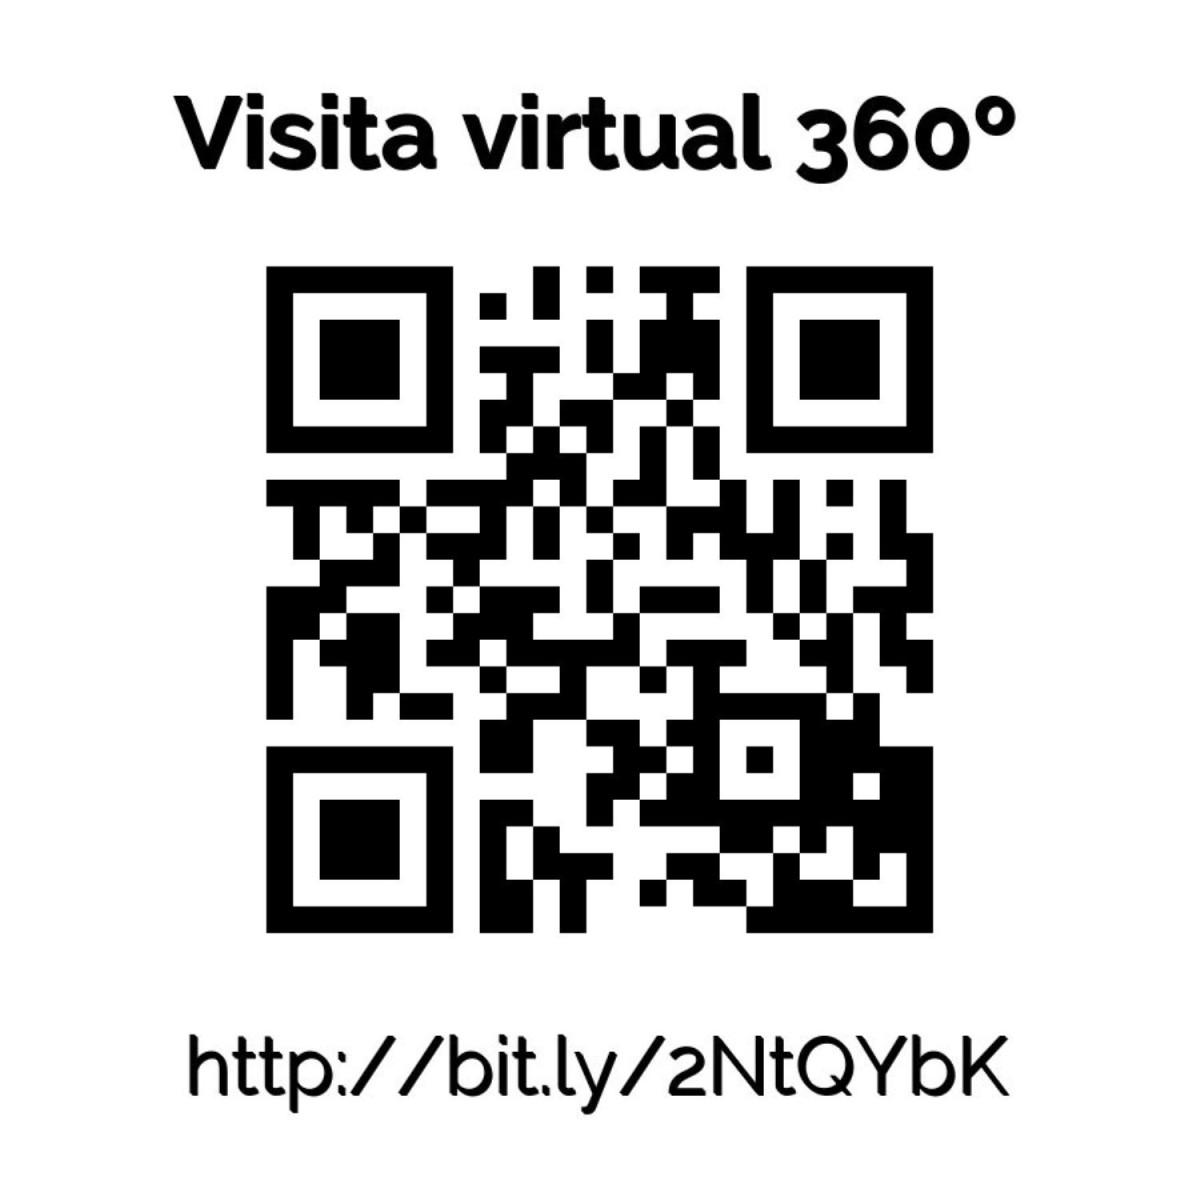 3408-03660